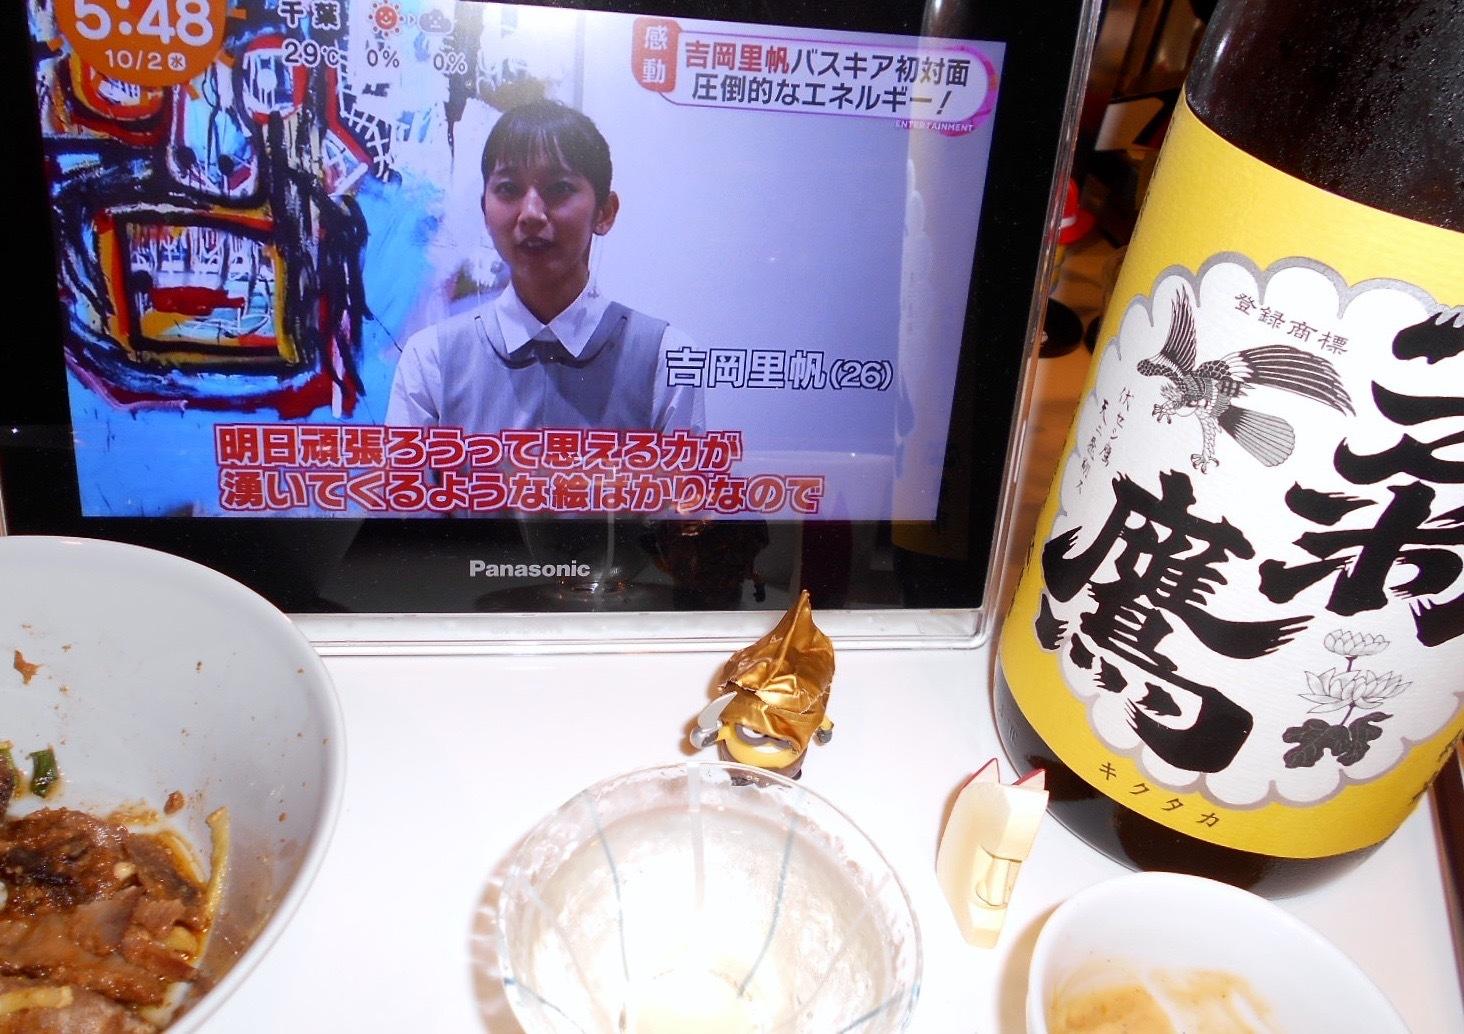 kikutaka8_29by2_8.jpg